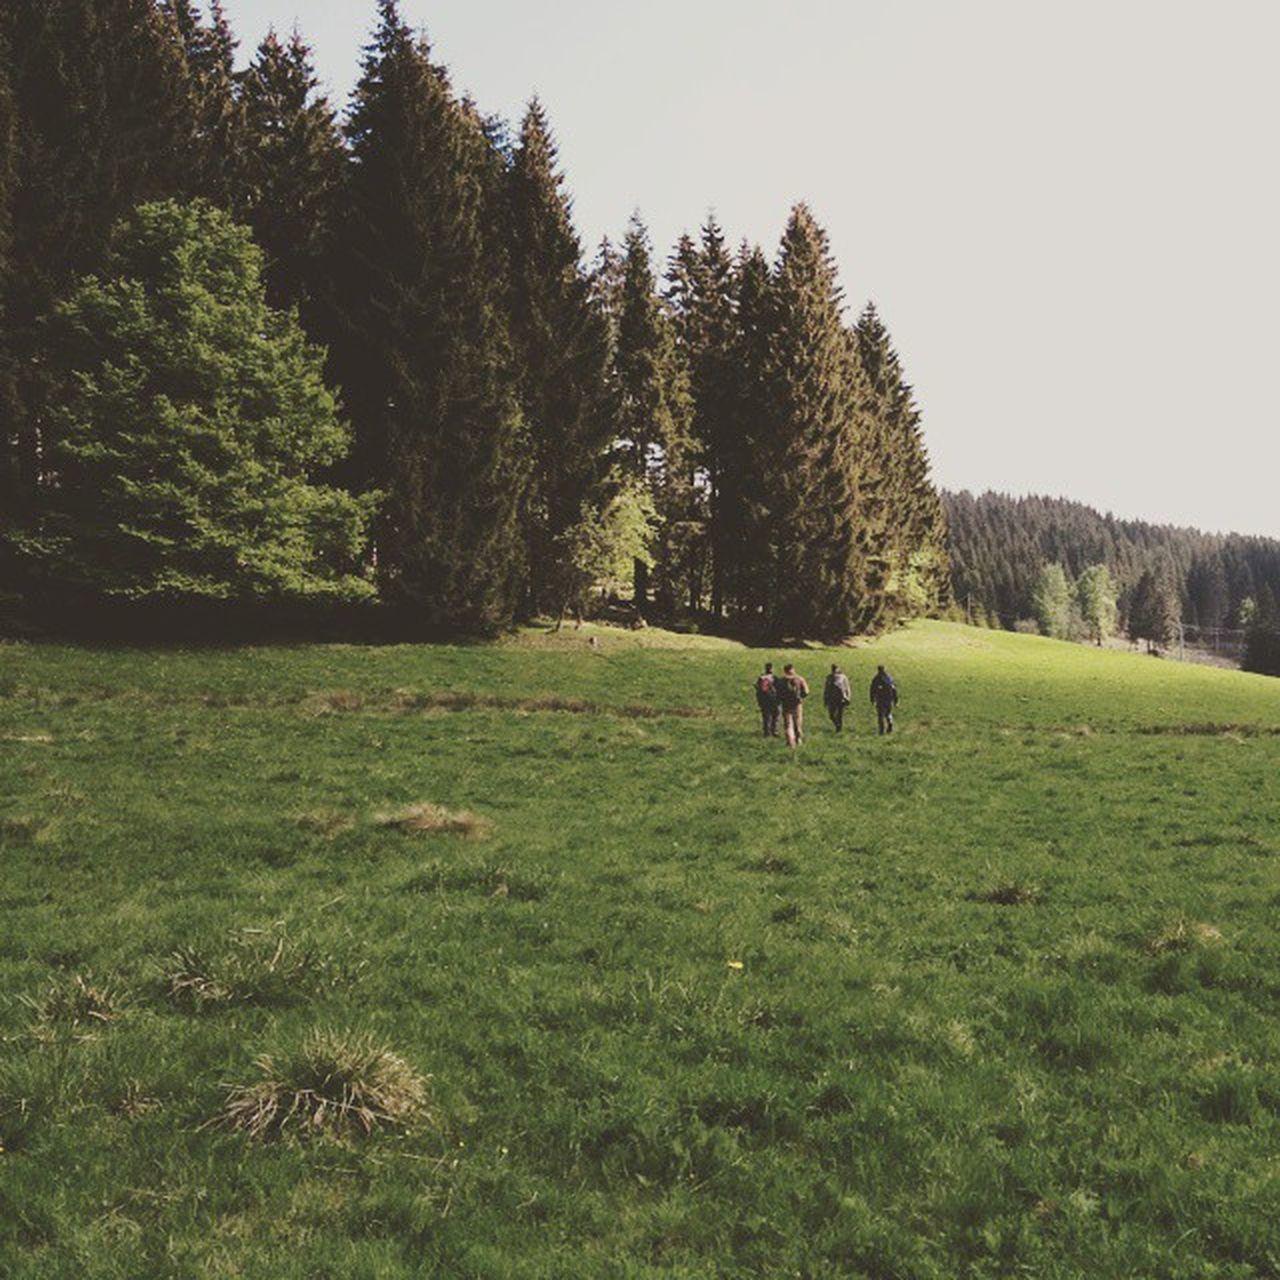 Walking, Talking, Drinking Fathersday Celebration Cometogheter Ilmenau rennsteig thuringia wood green nature outdoor walking